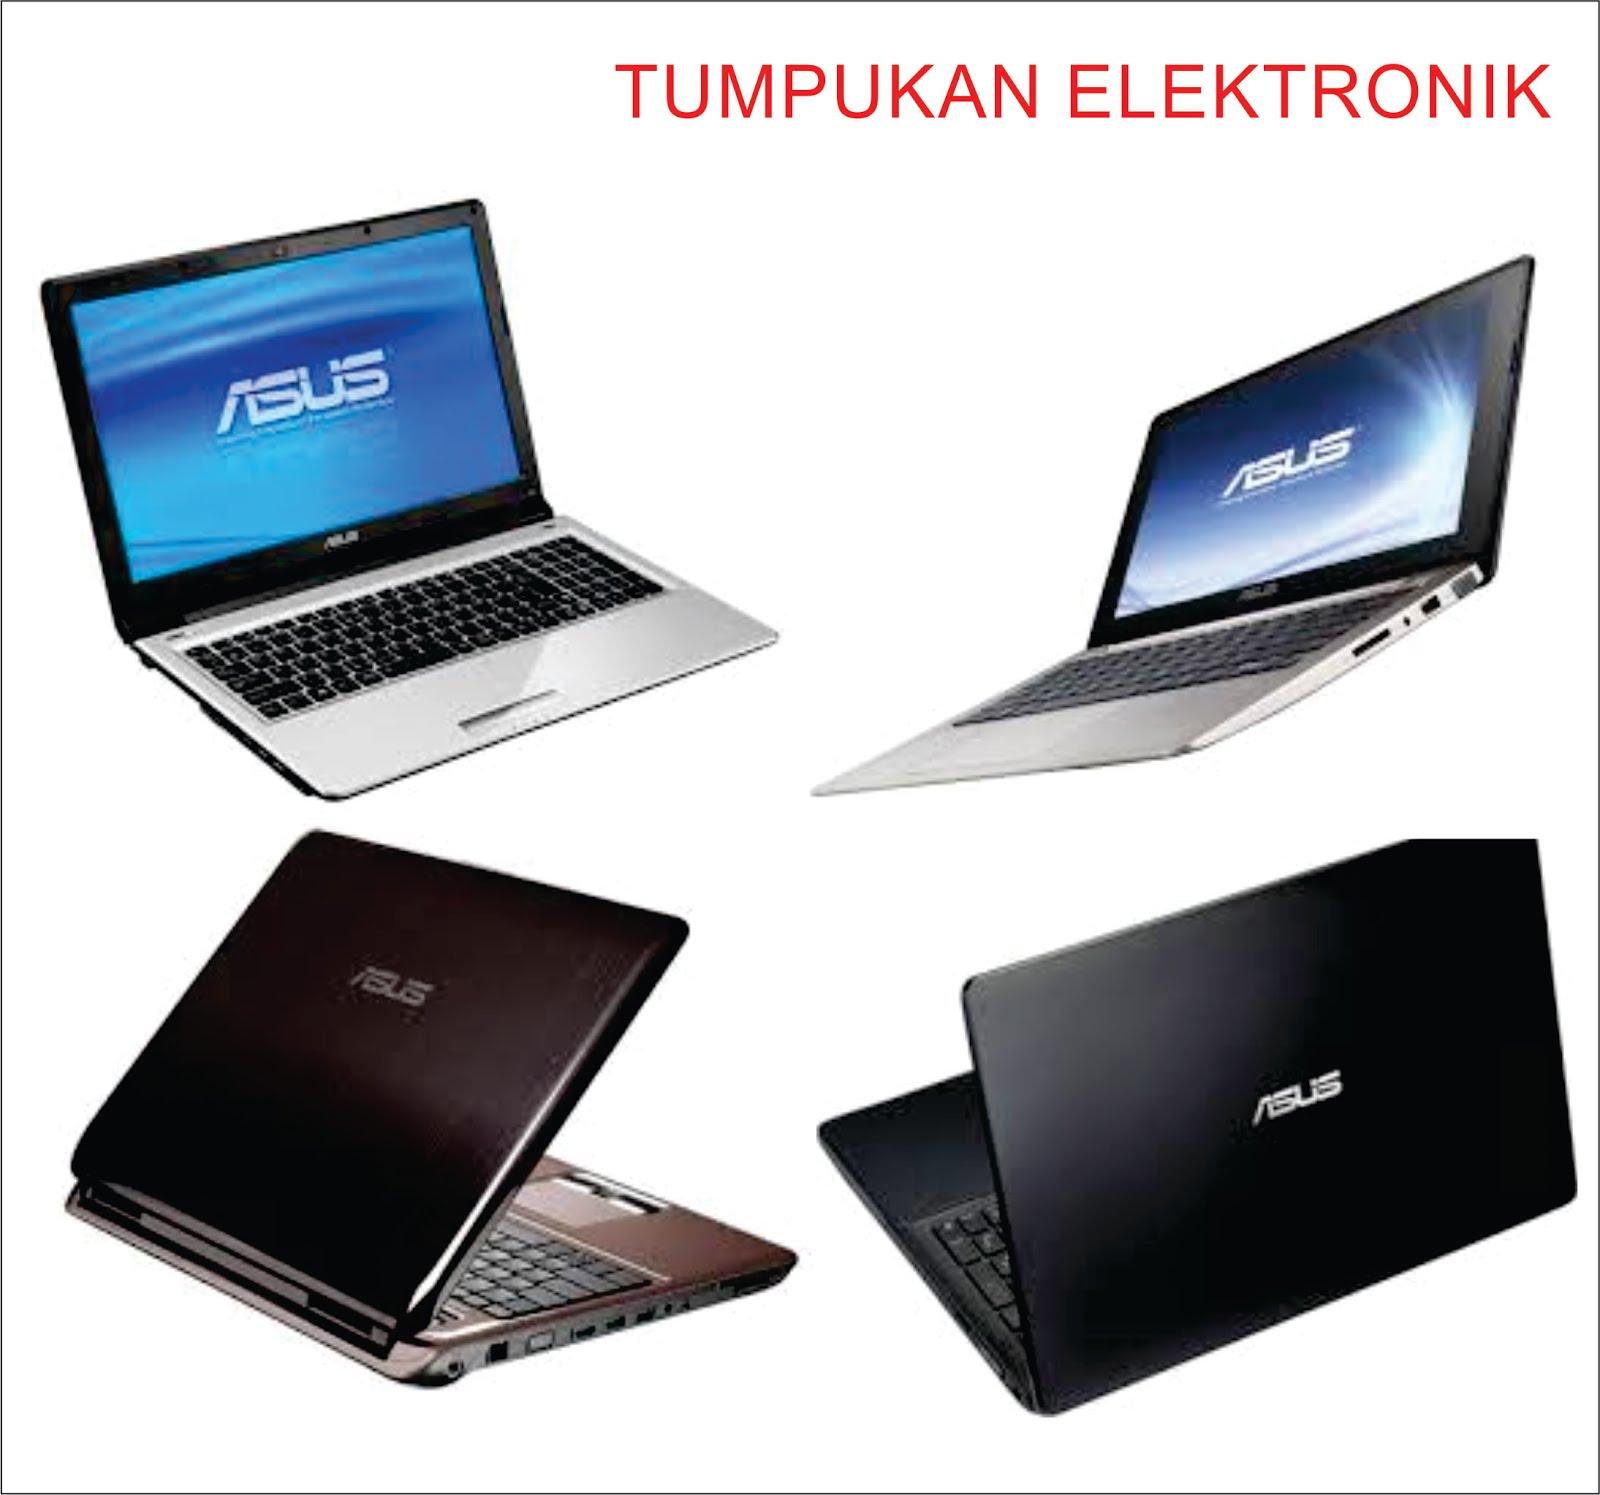 Motherboard Asus Indonesia Maret